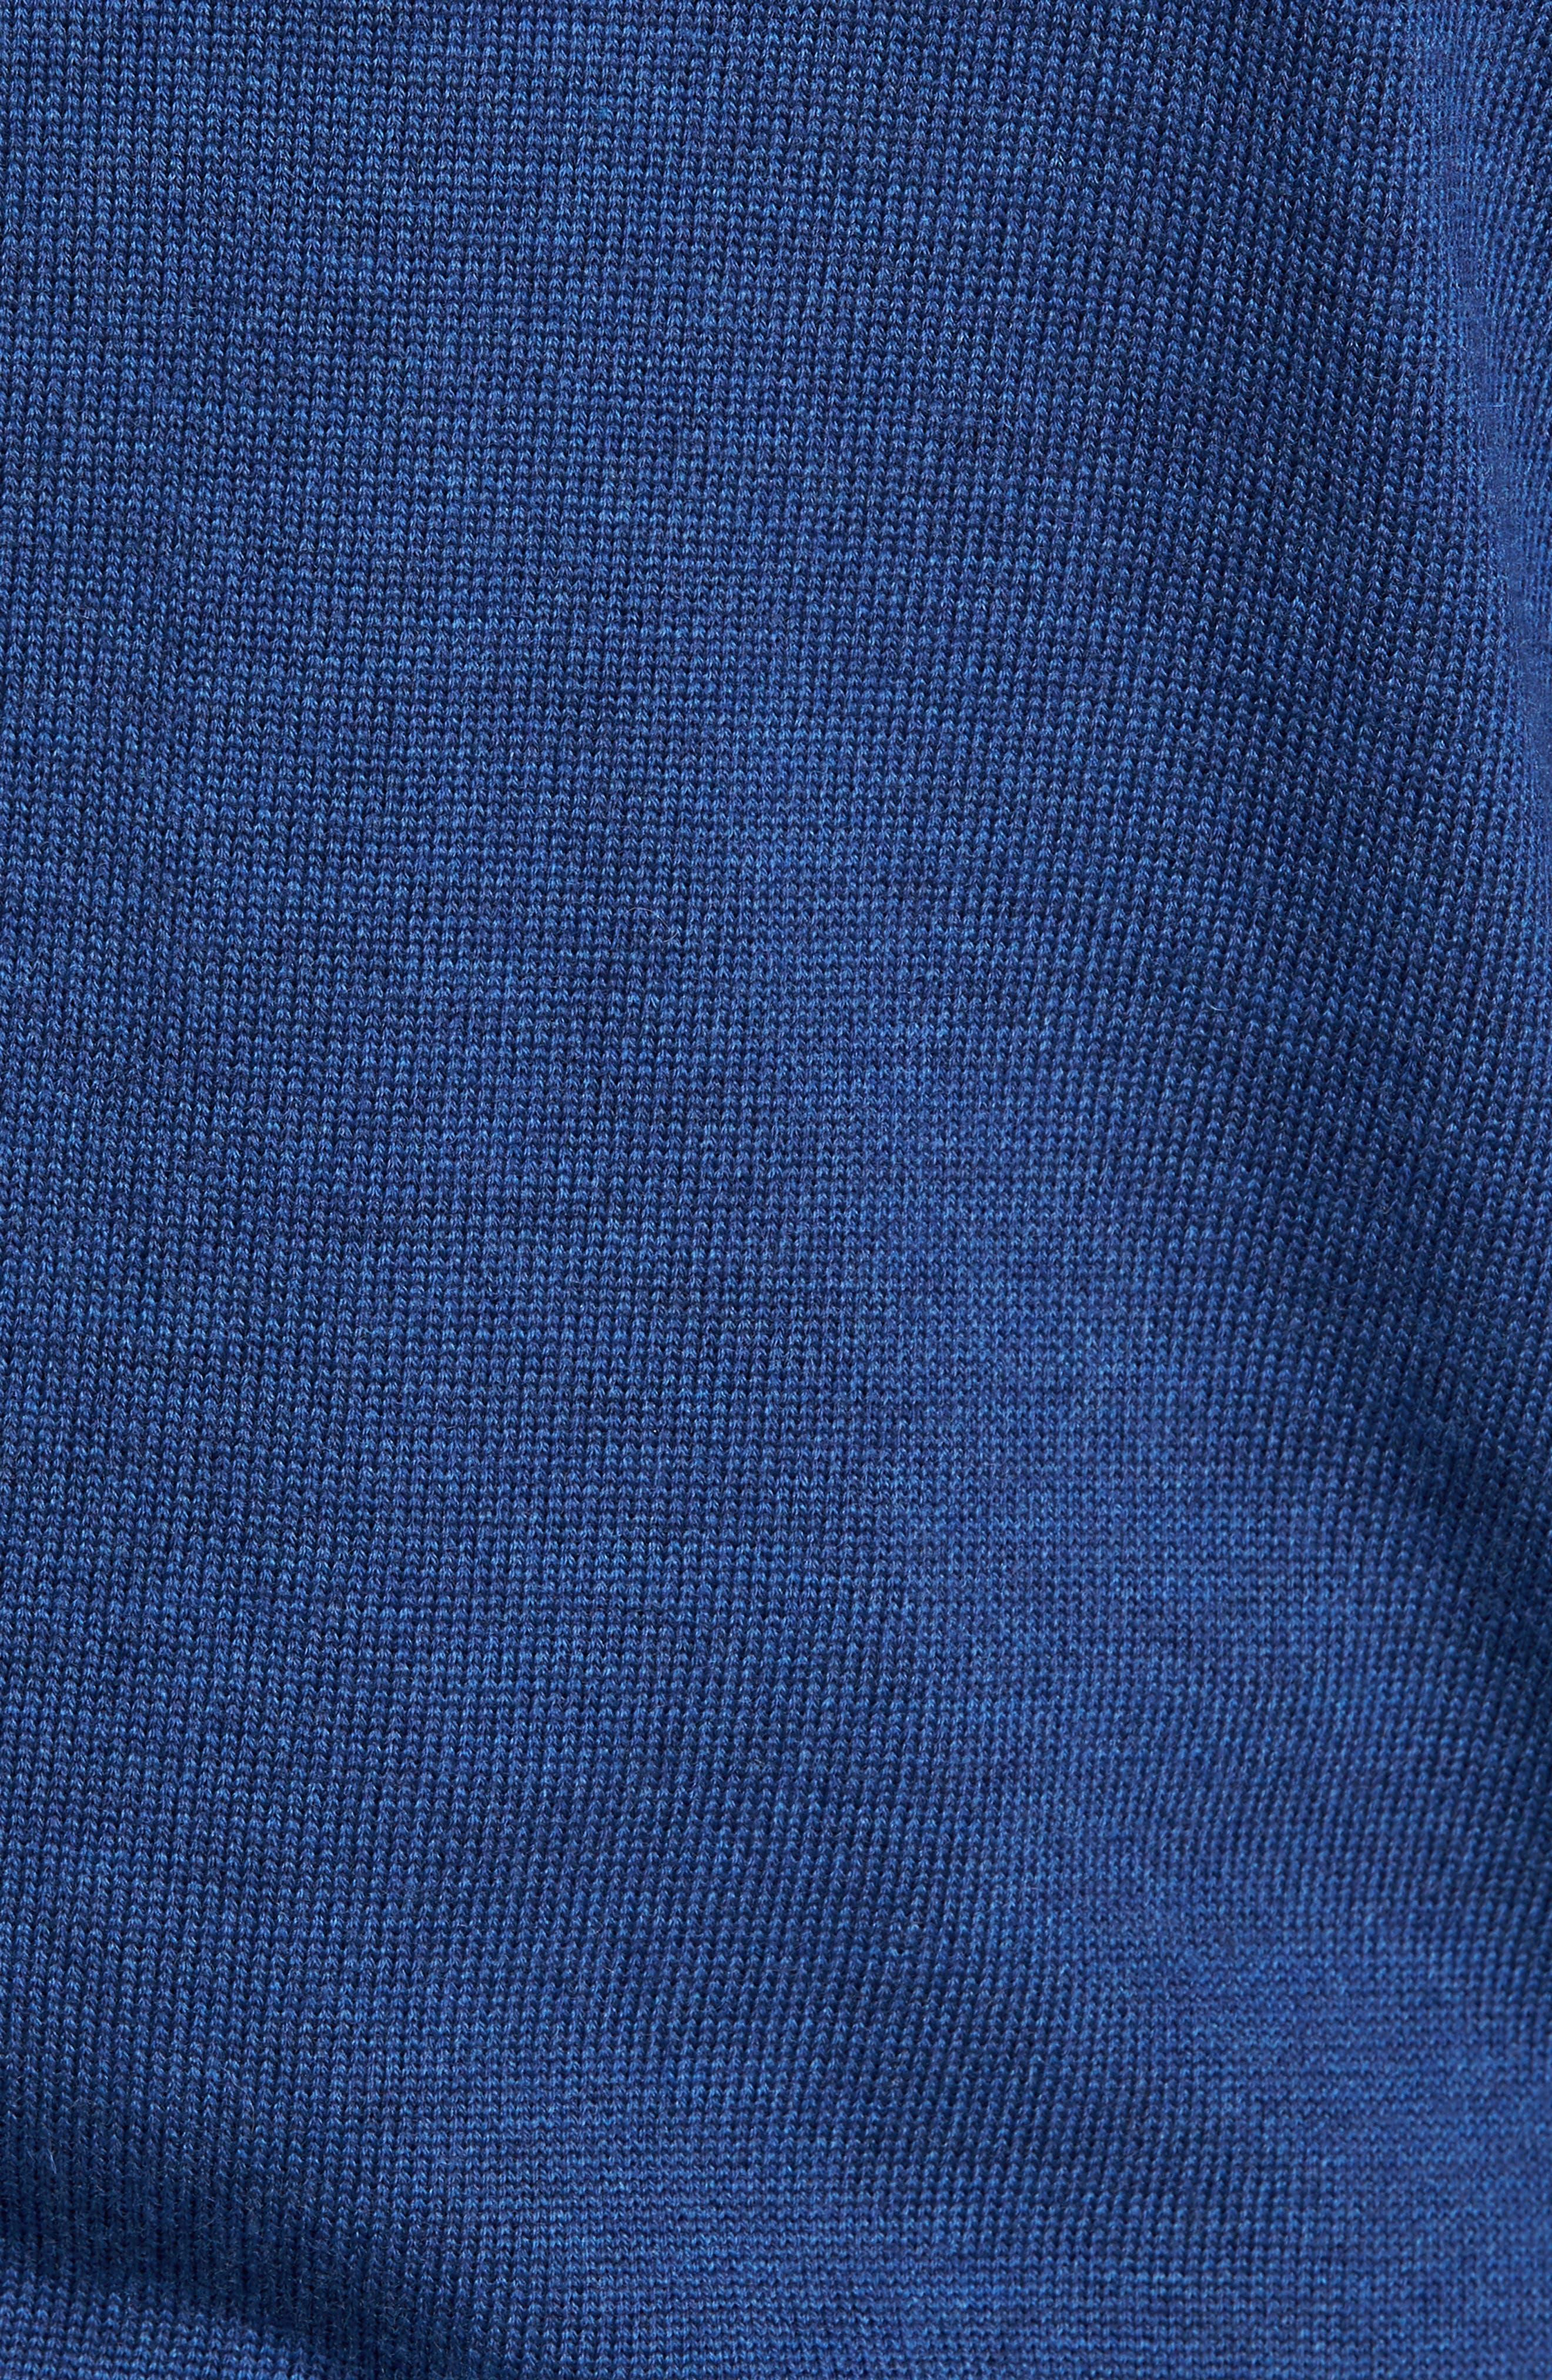 Alternate Image 5  - Rodd & Gunn Grand Vue Hooded Zip Front Knit Sweater